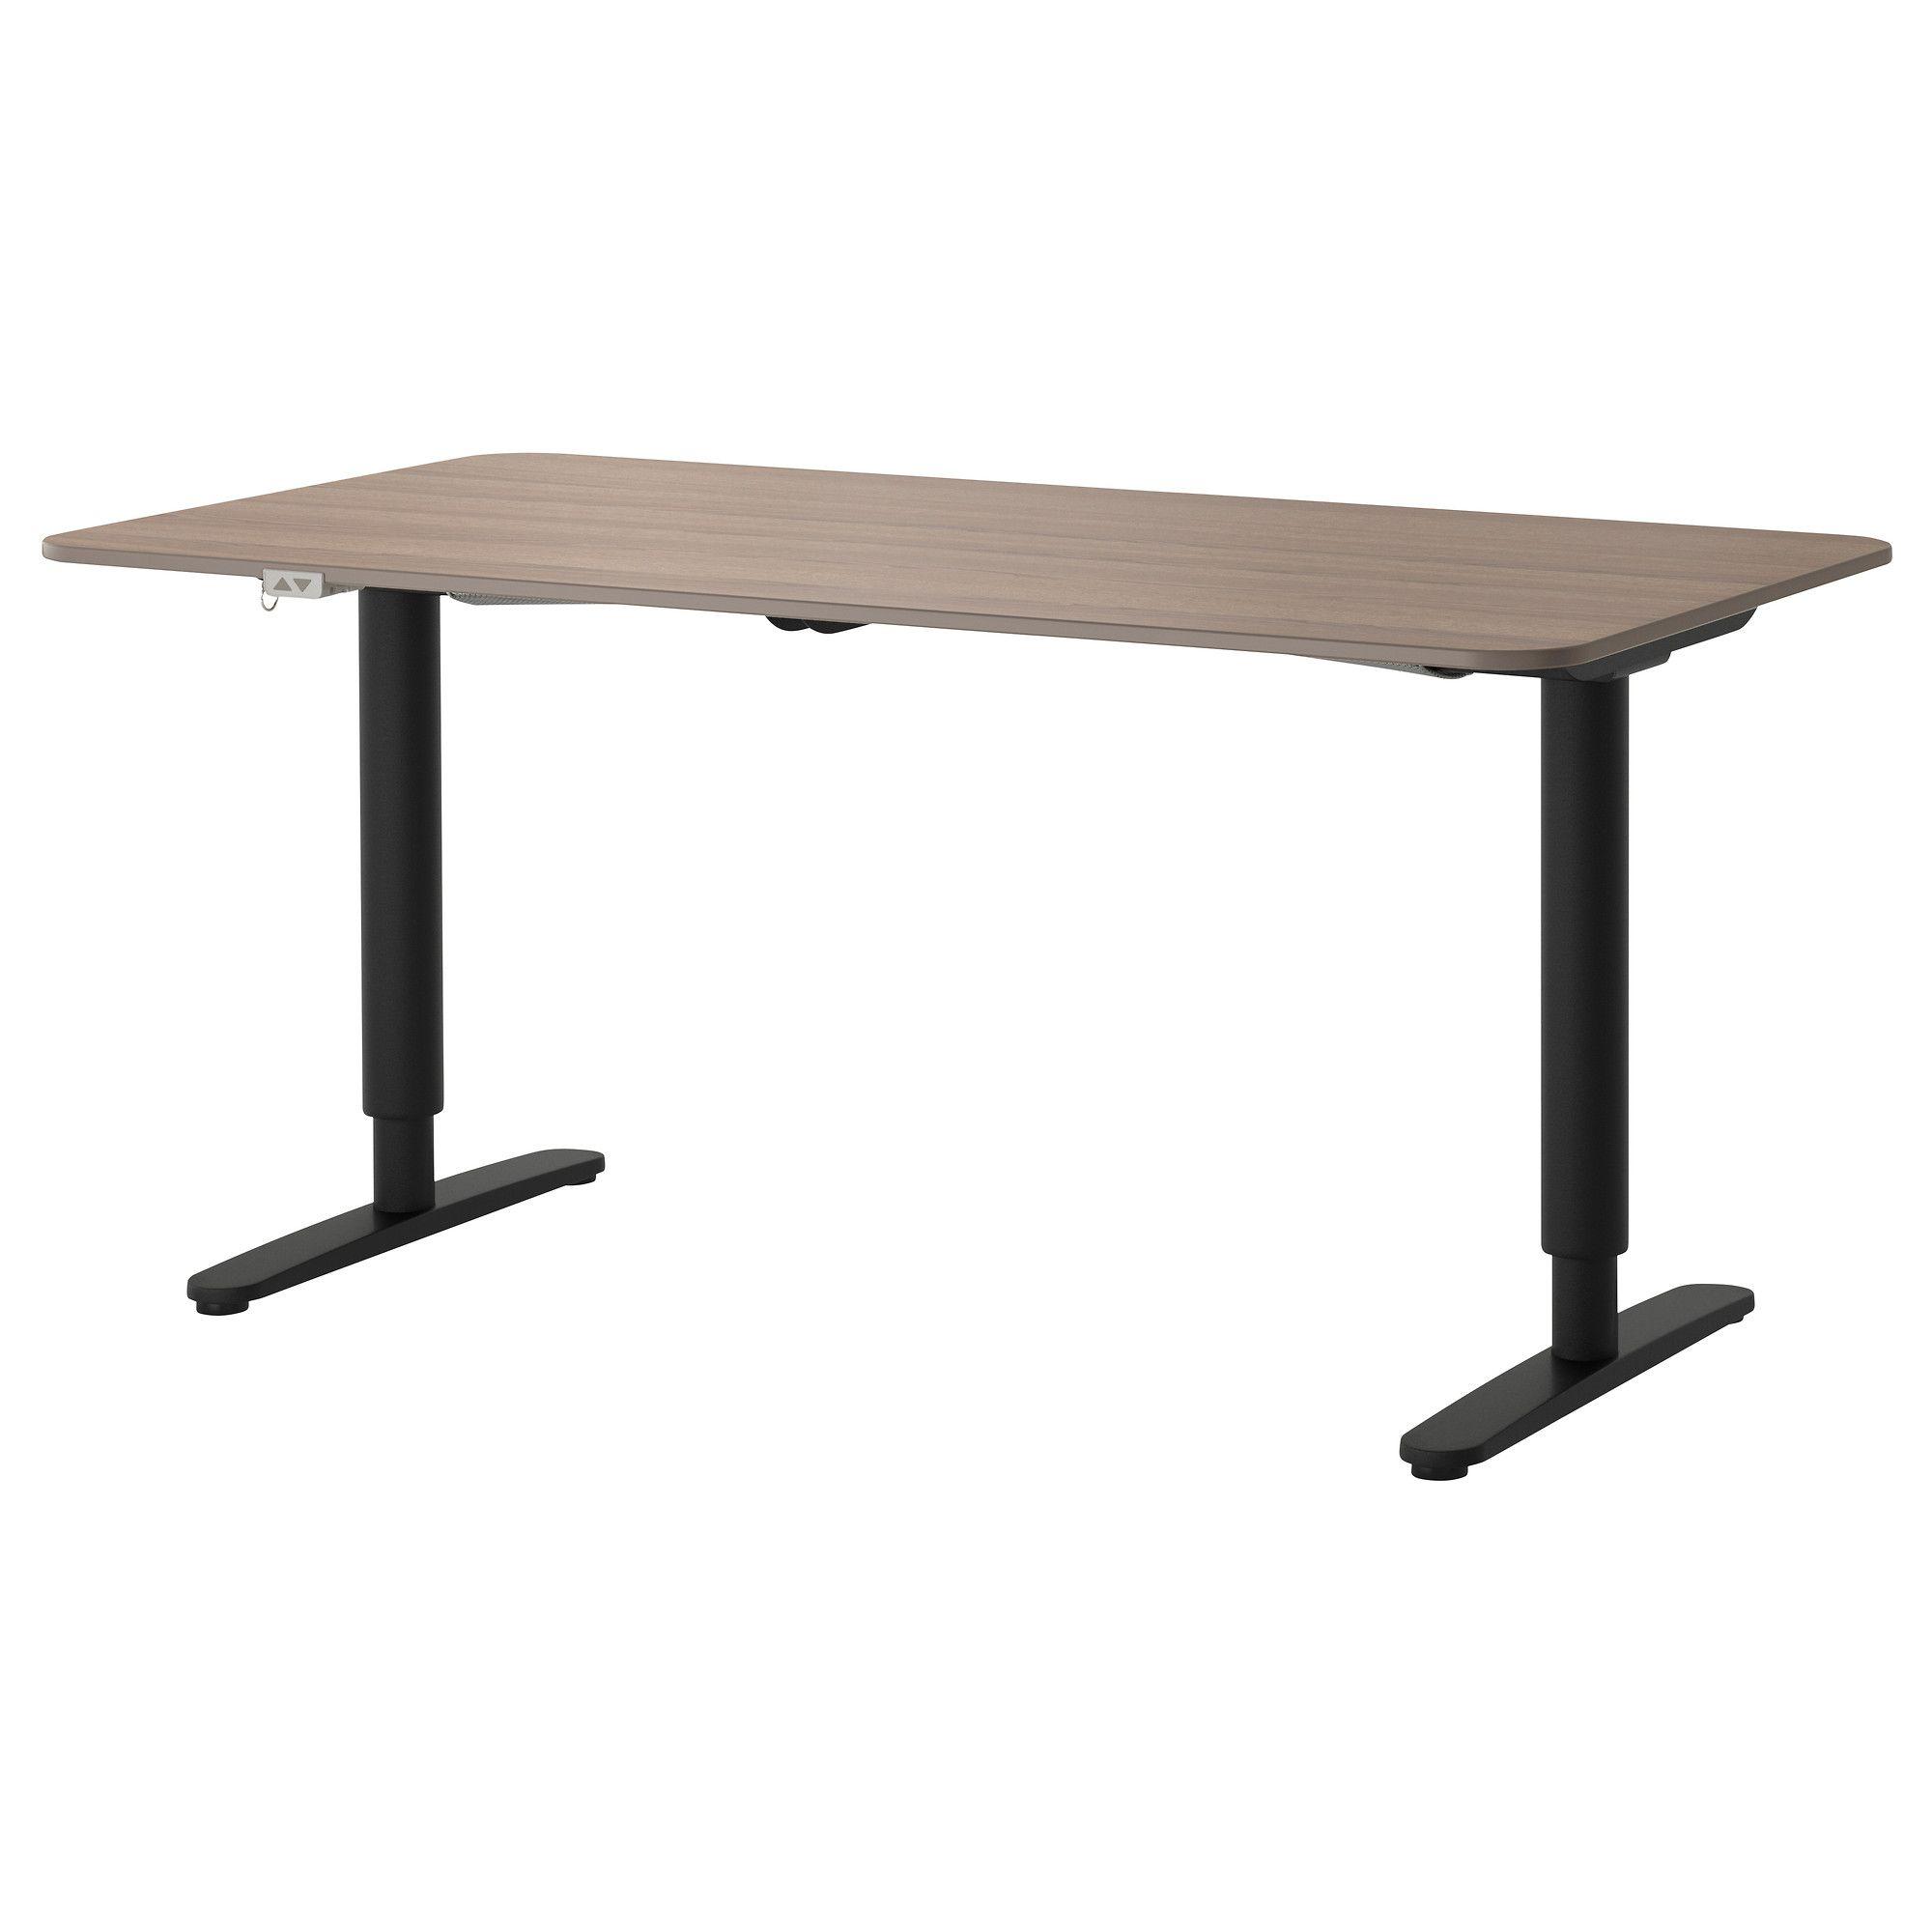 Ikea Us Furniture And Home Furnishings Ikea Bekant Ikea Ikea Office Table